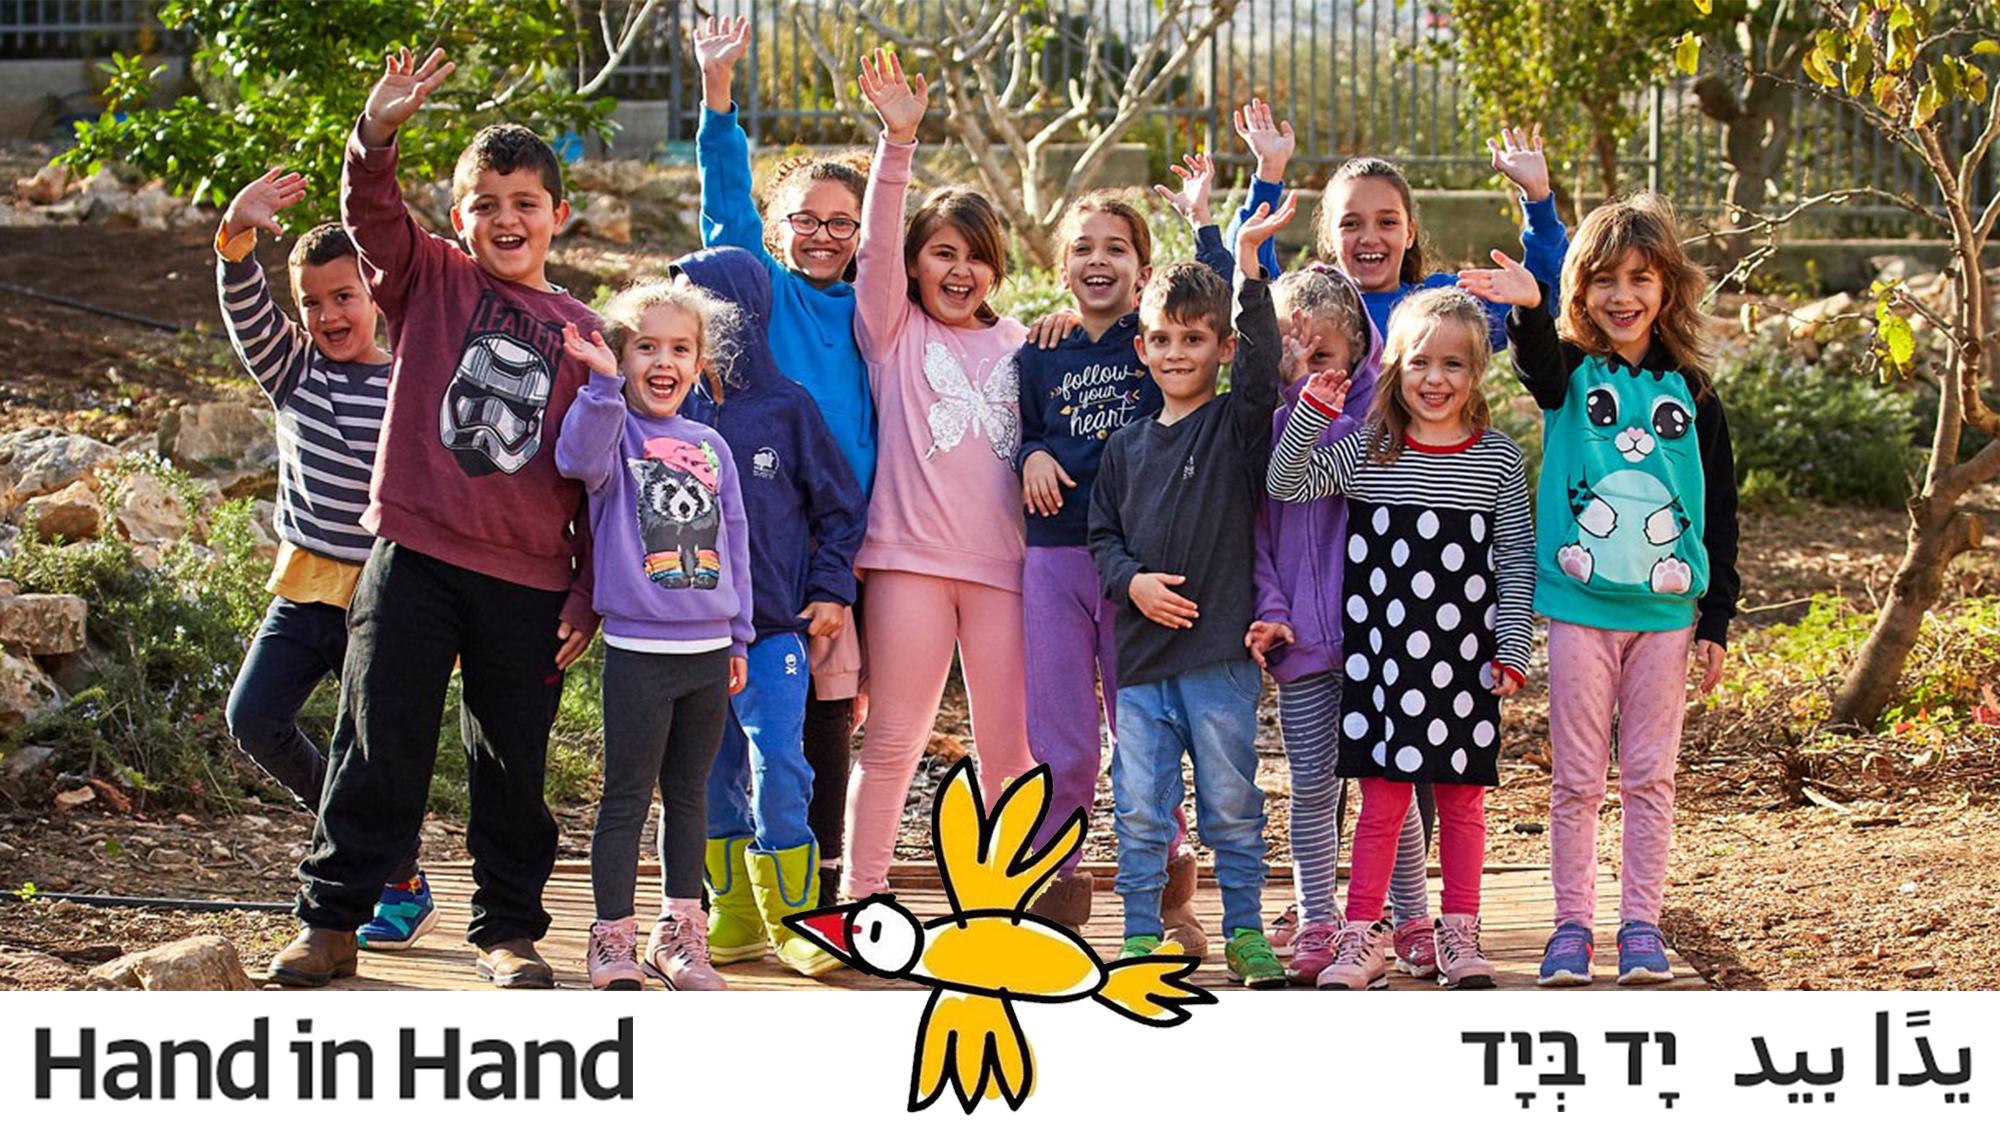 Building Peace & Partnership Between Arabs & Jews in Israel